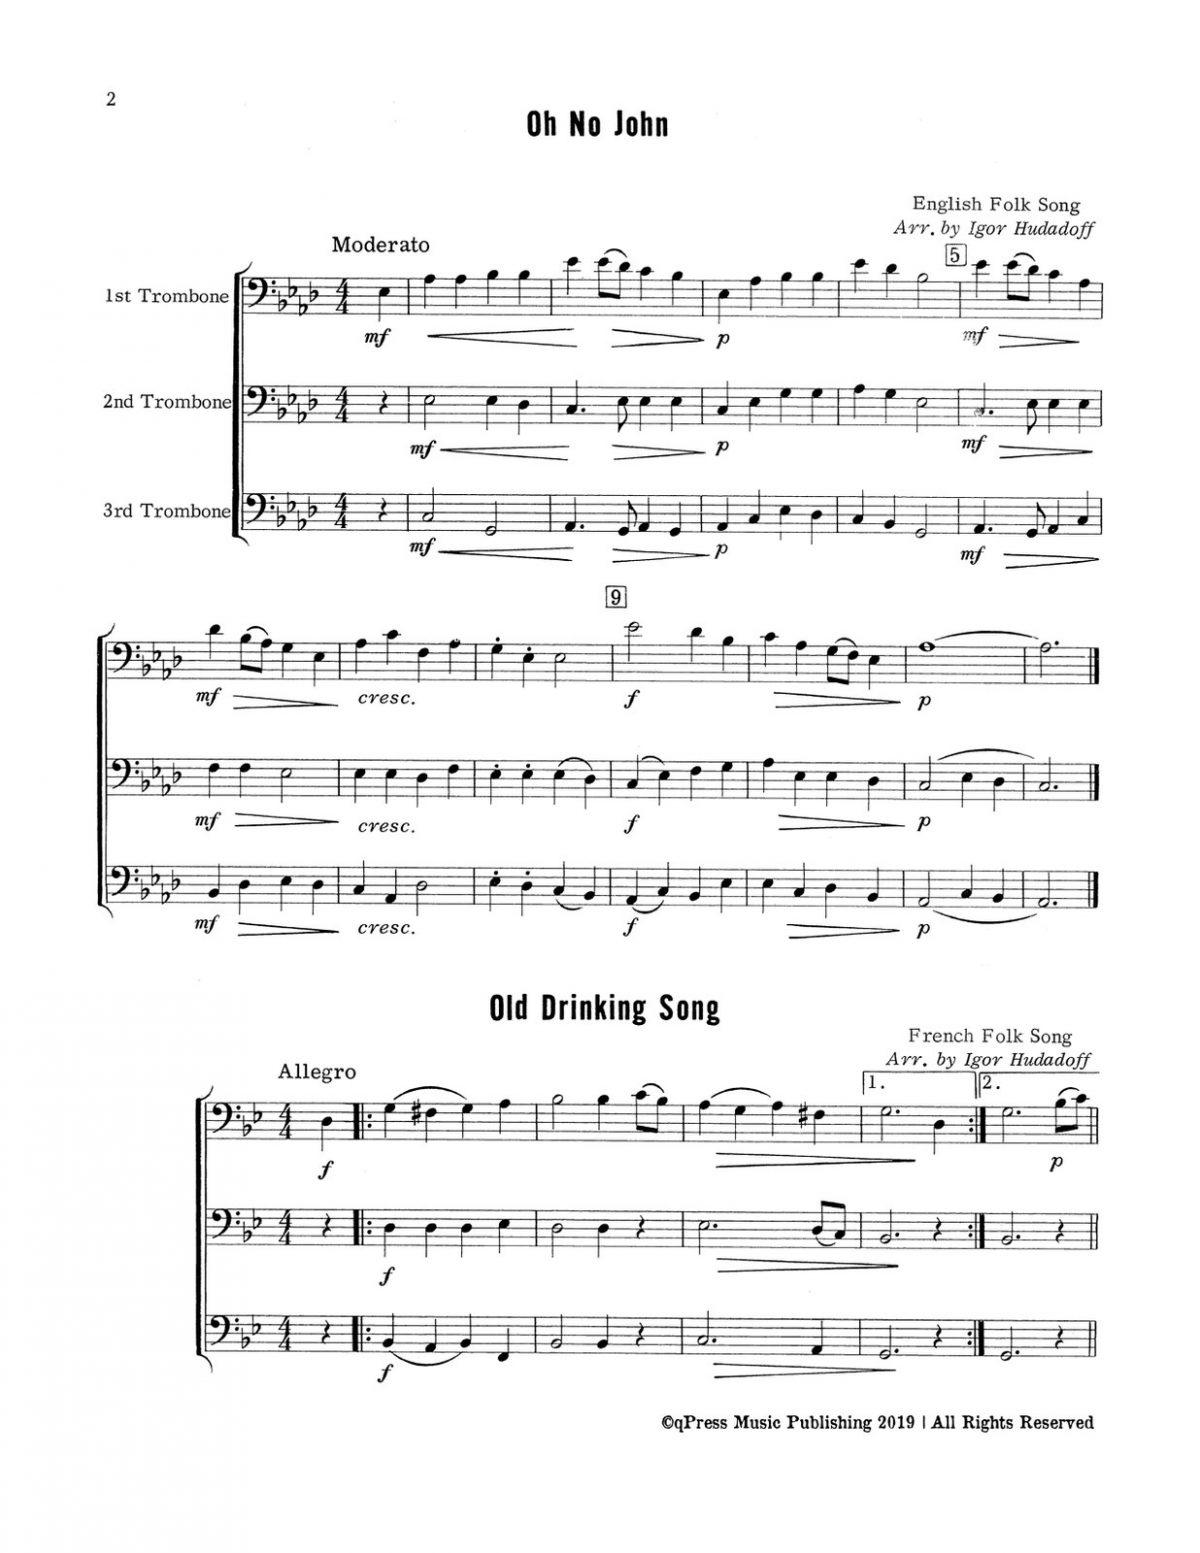 Hudadoff, 24 Trombone Trios-p04